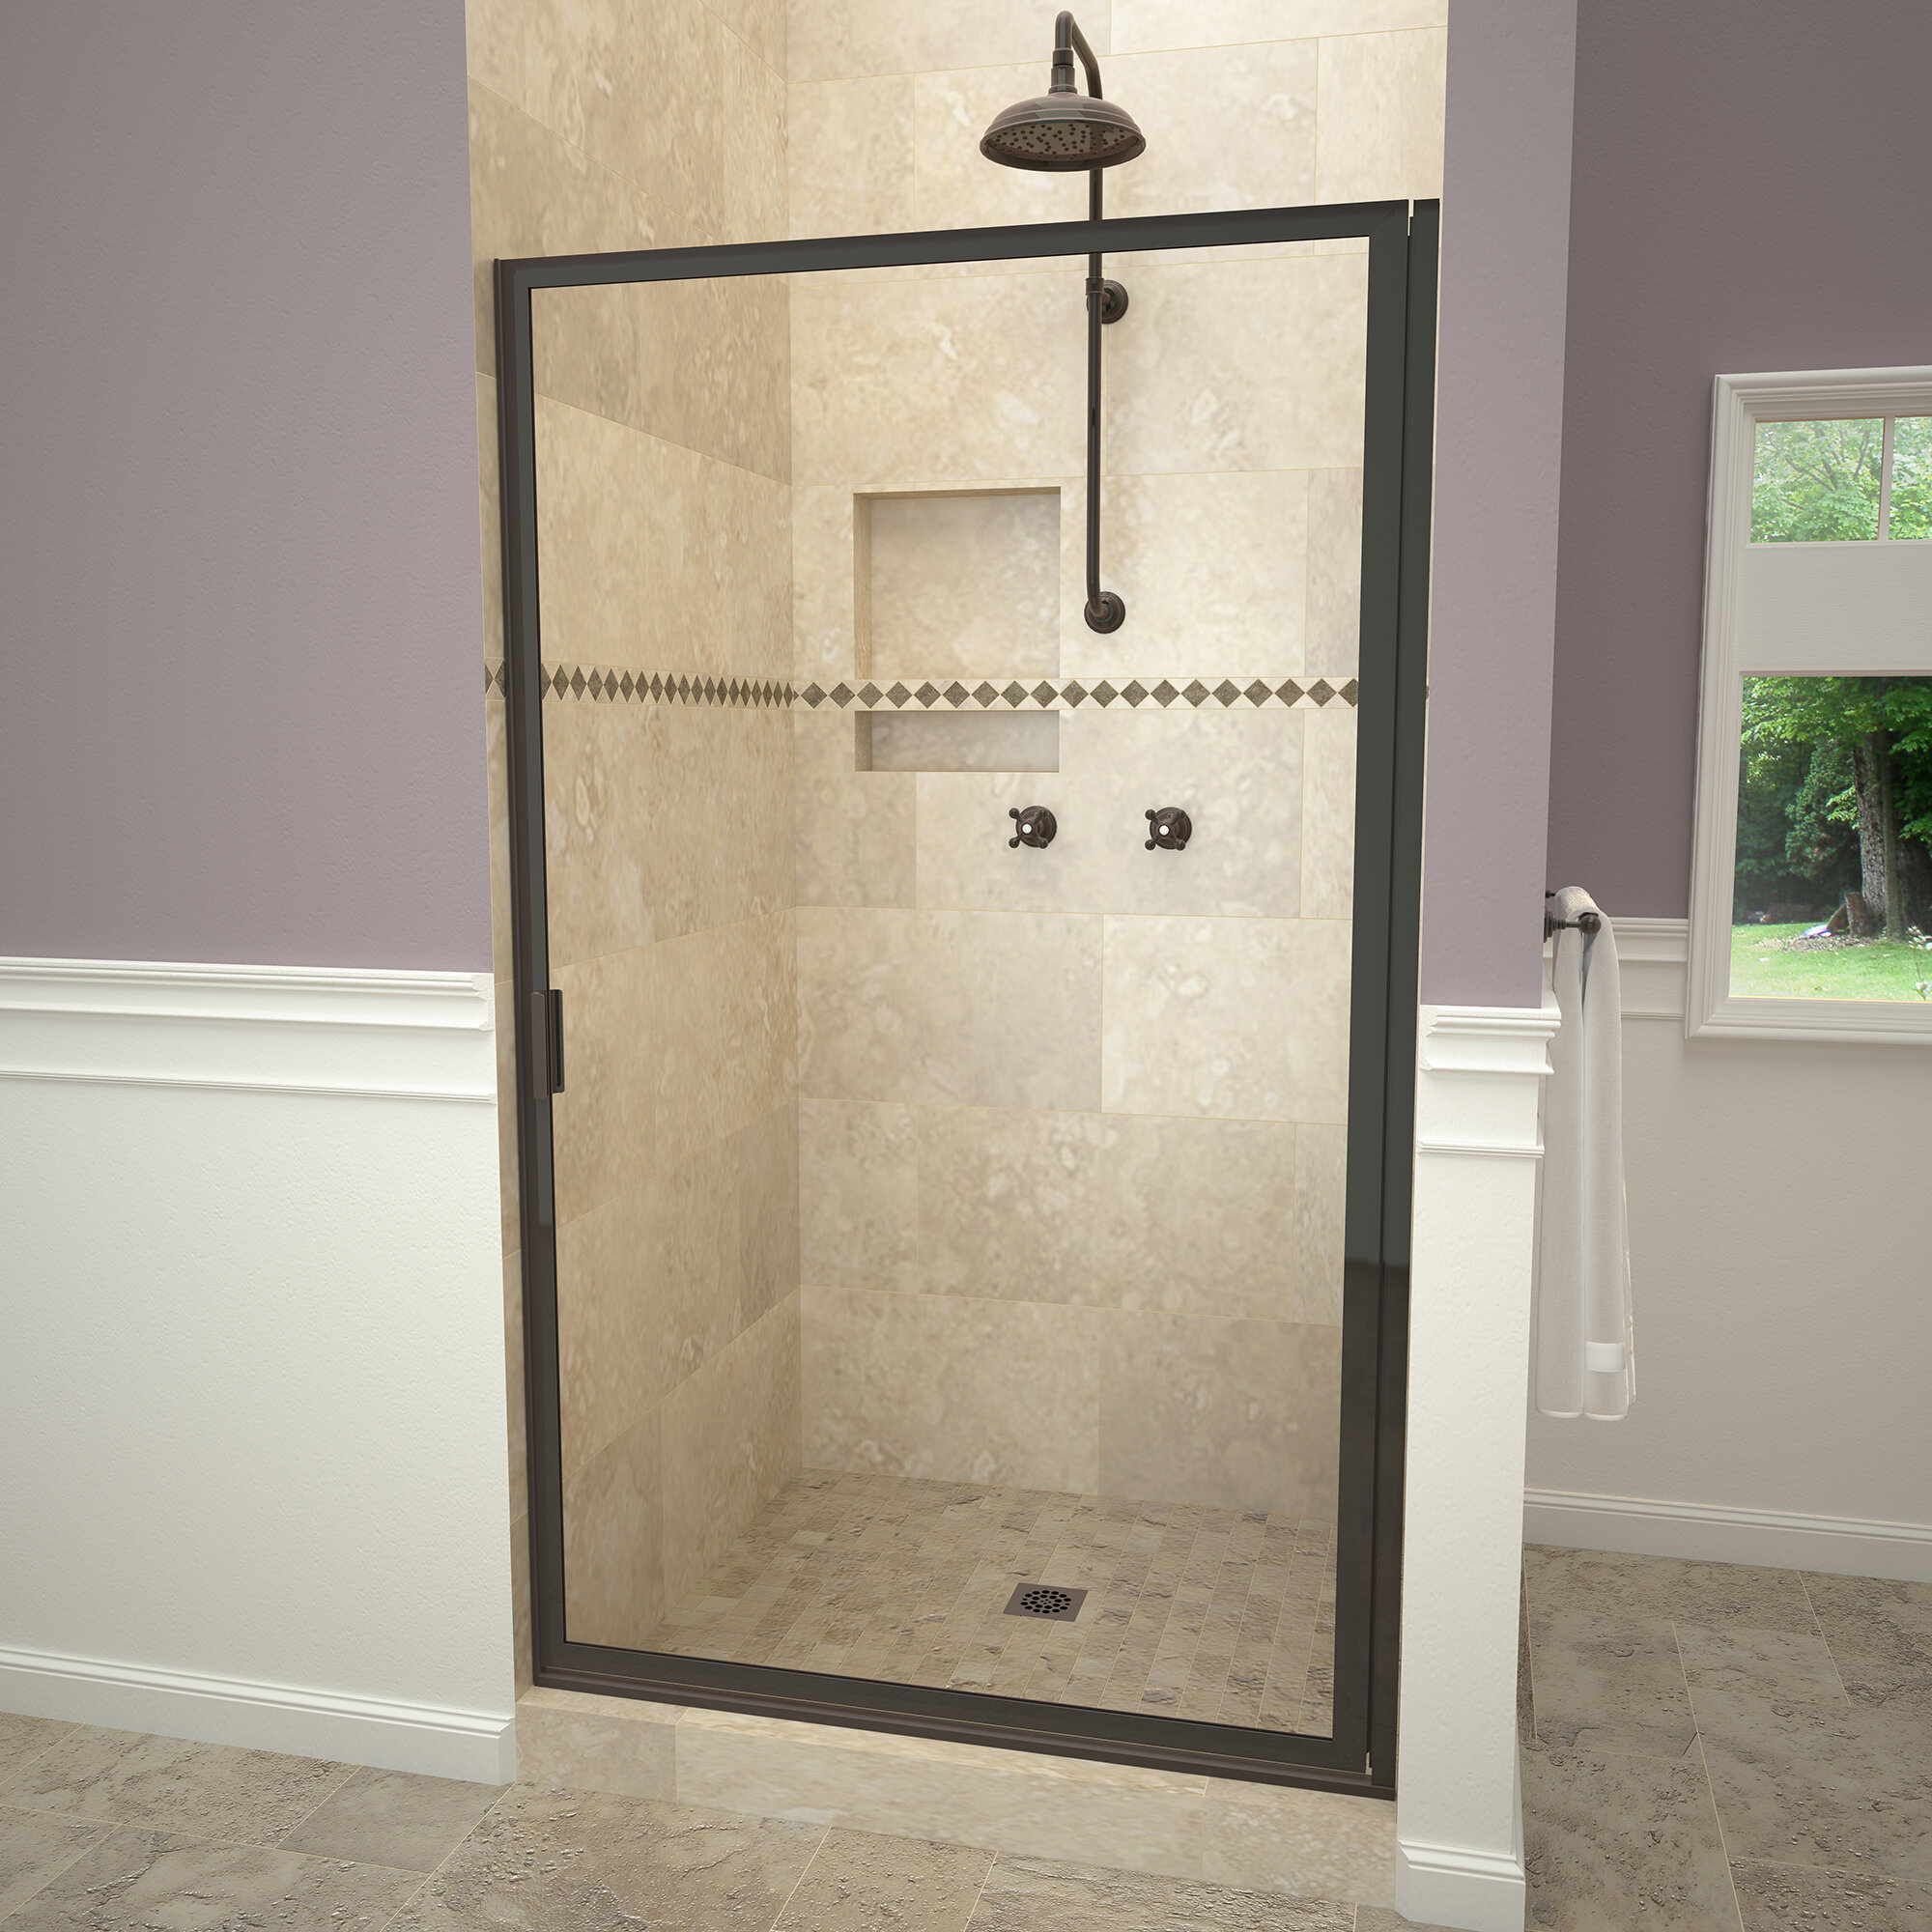 Details About 1100 Series Swing 34 75 X67 Pivot Framed Shower Door Oil Rubbed Bronze Pattern